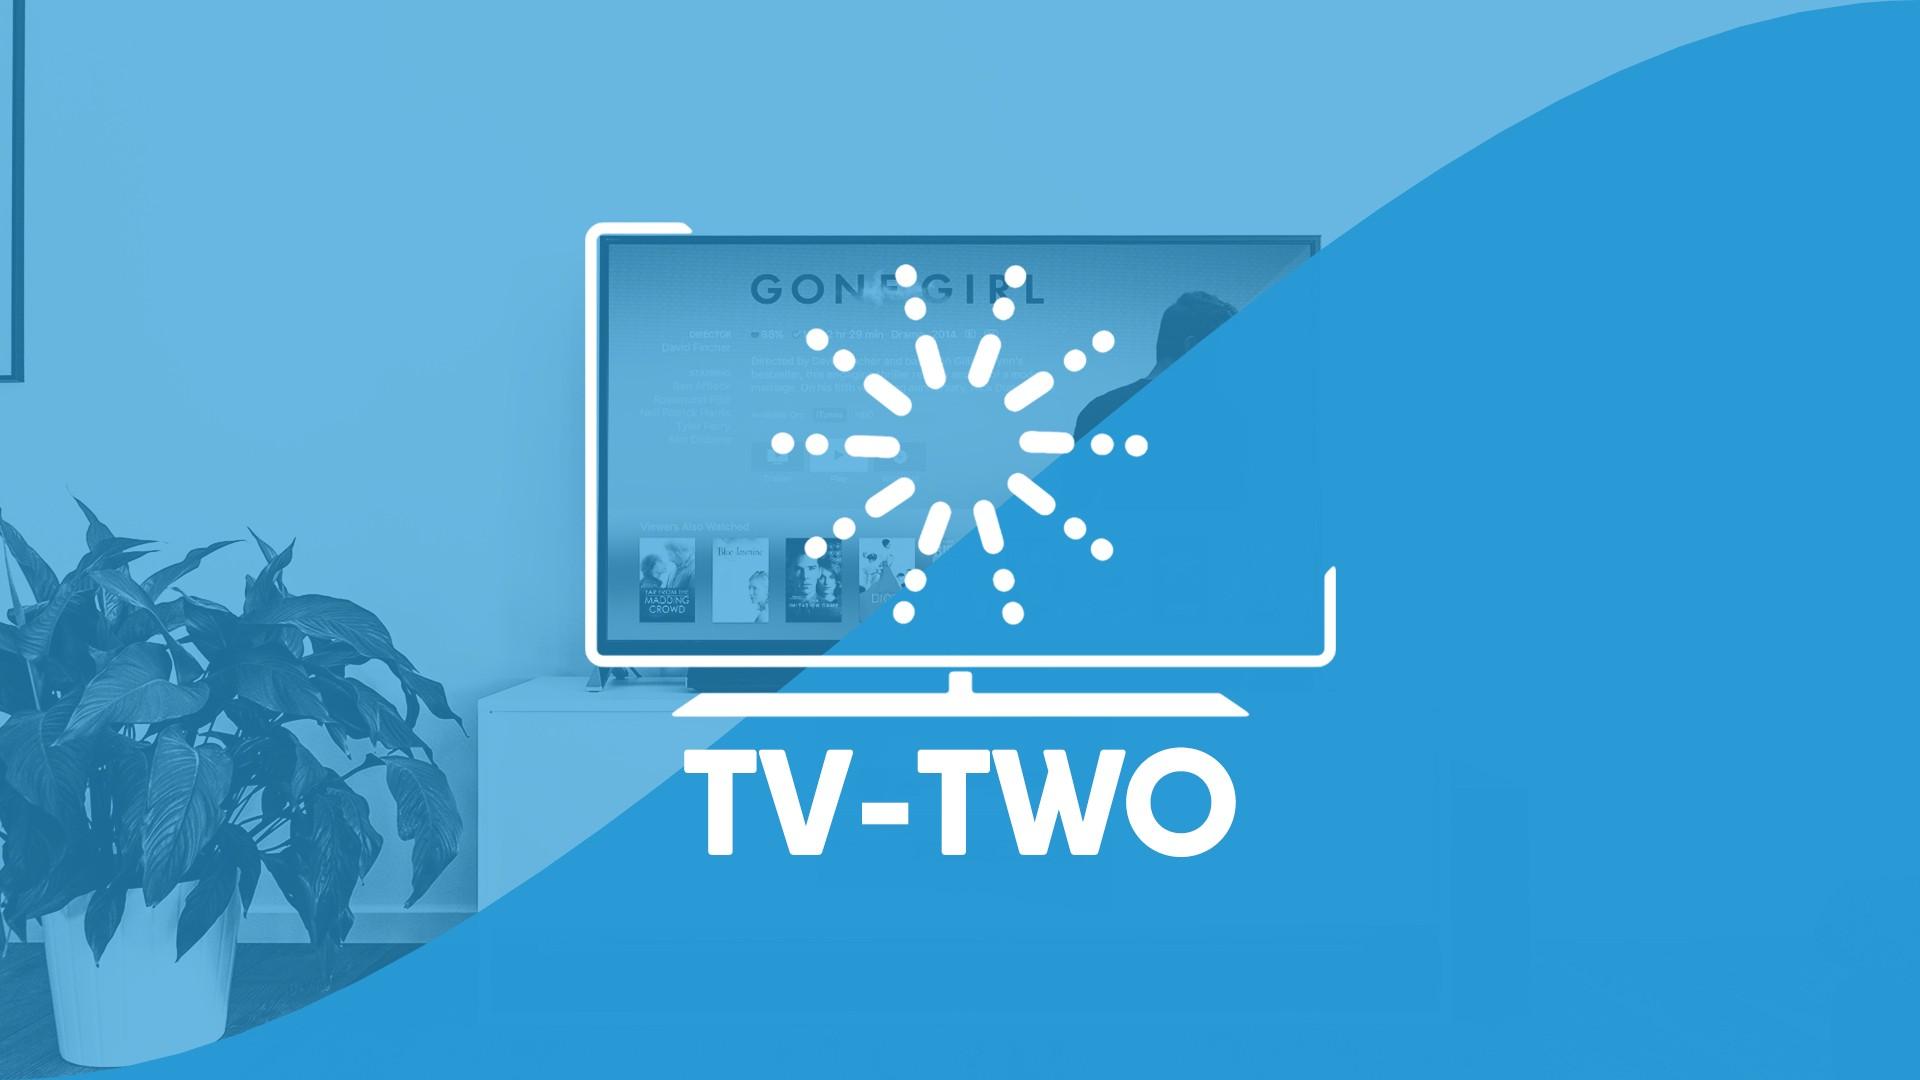 TV-TWO (ティーブイツー) 現在のテレビエコシステムを解決するための分散型ソリューション